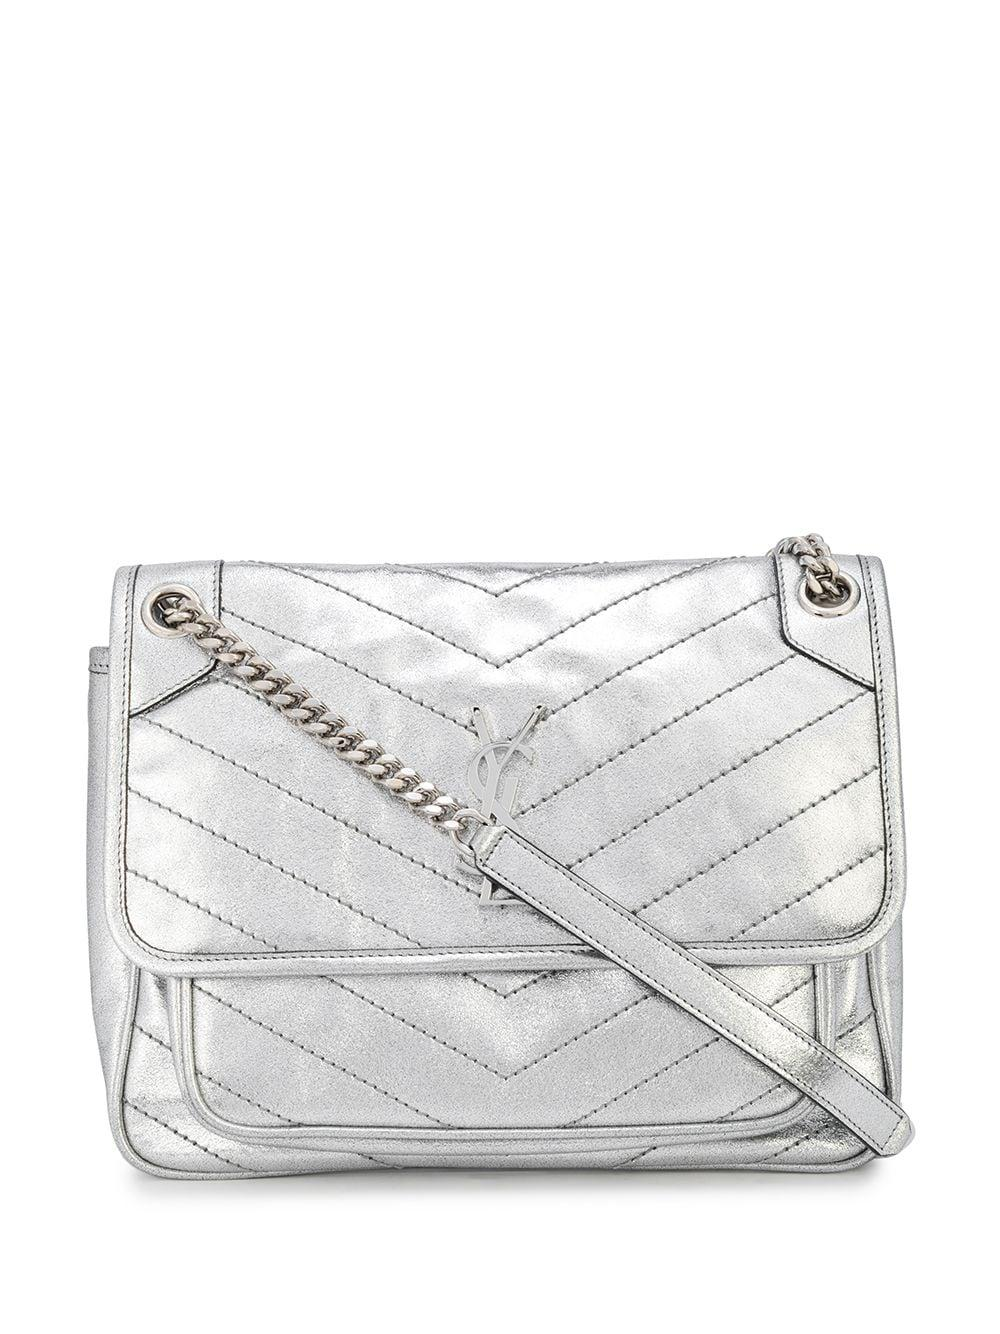 Niki Mono Crystal Lame Shoulder Bag Item # 5750551Q302